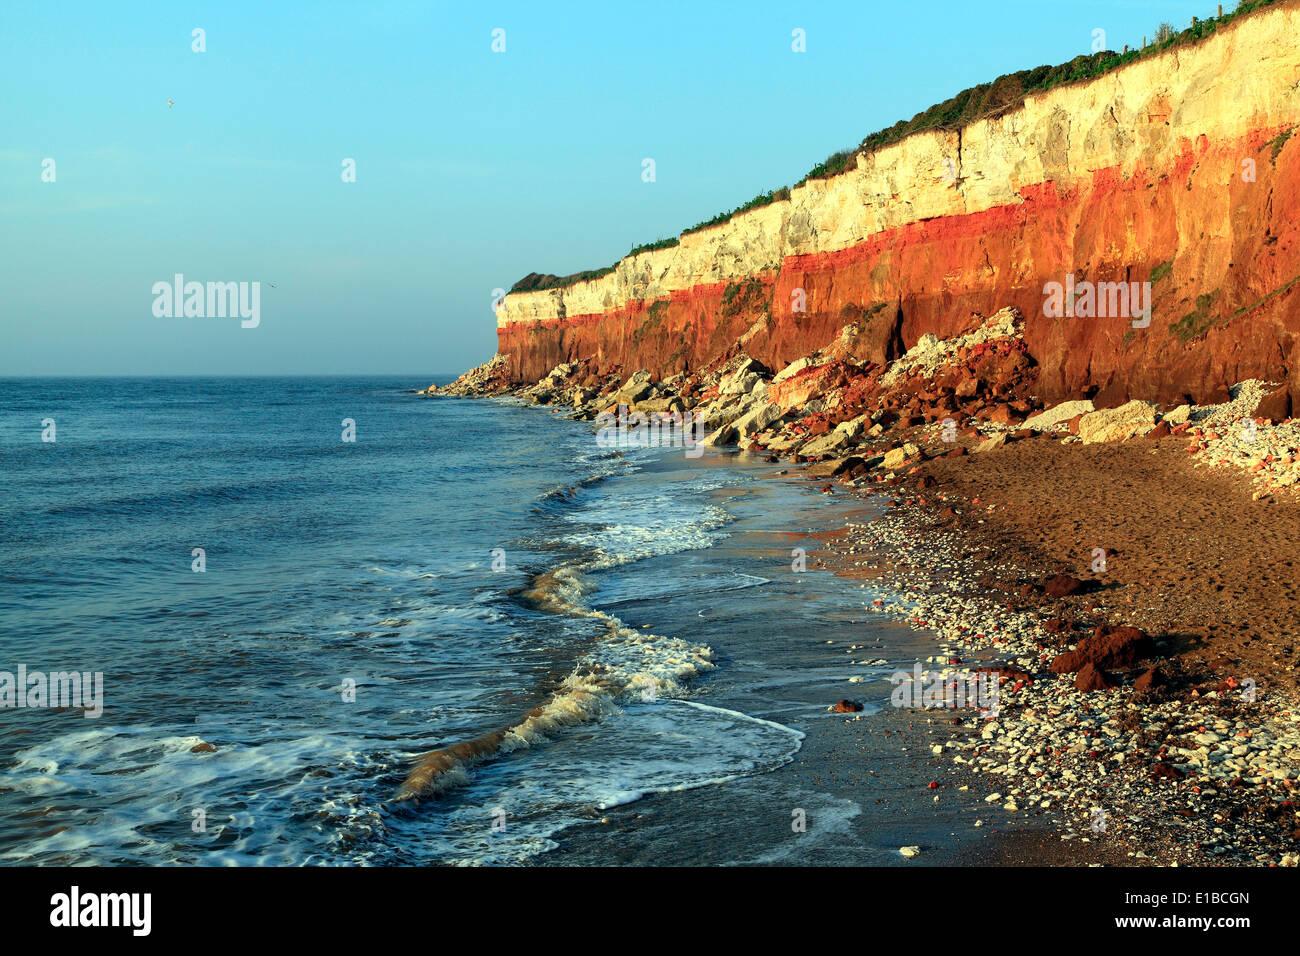 Old Hunstanton Cliffs, High Tide, Norfolk England English North Sea coast coasts coastal scenery beach beaches UK - Stock Image